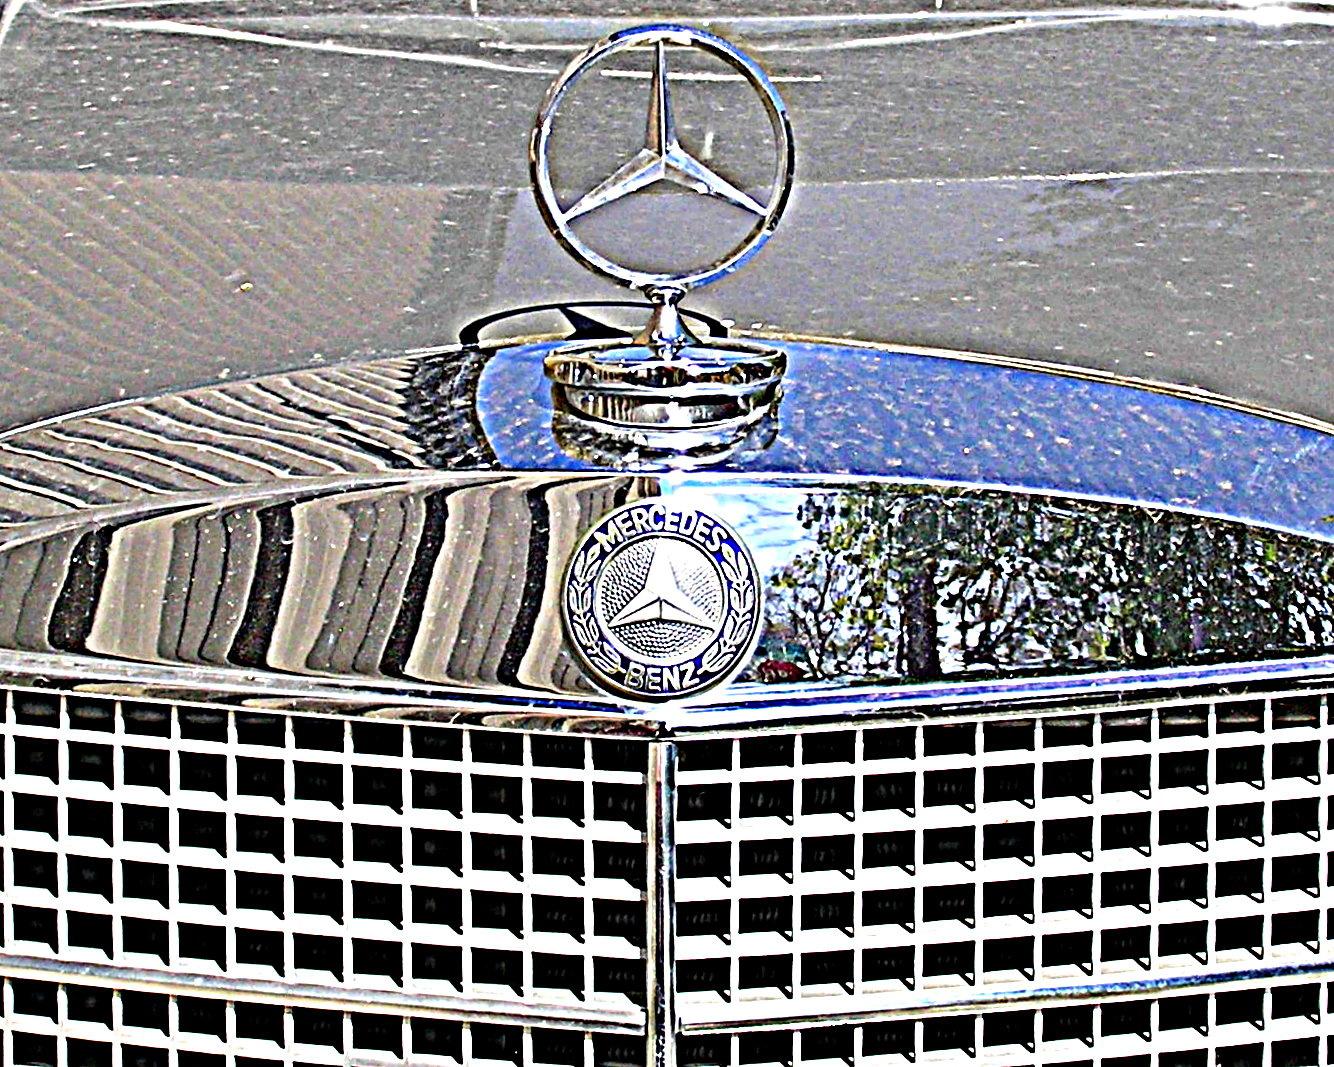 Mercedes-Benz 560-Class Questions - My Mercedes 1991 560sel is